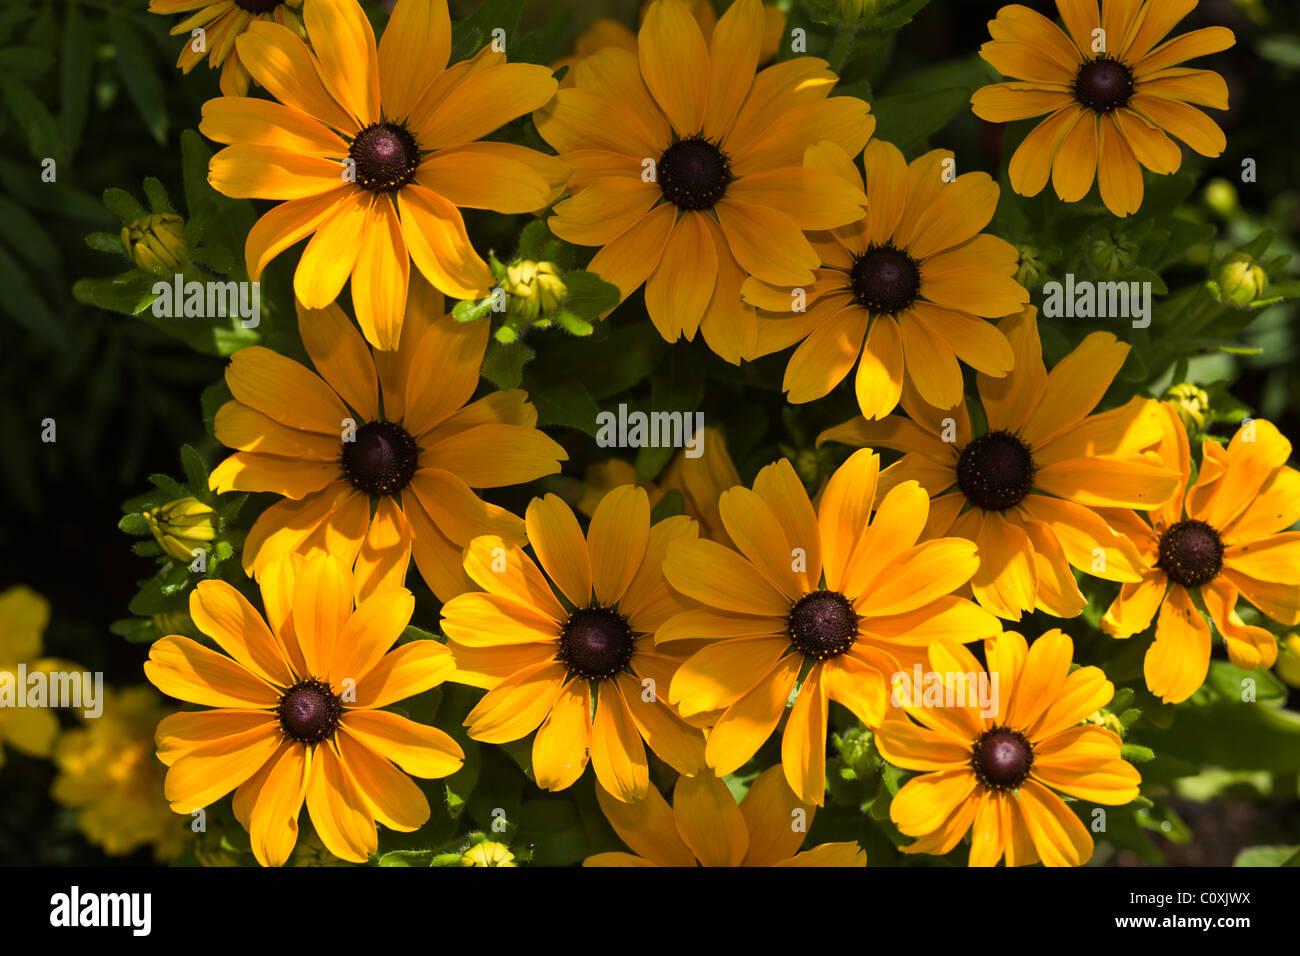 Field of yellow Coneflower Echinacea paradoxa, Germany - Stock Image